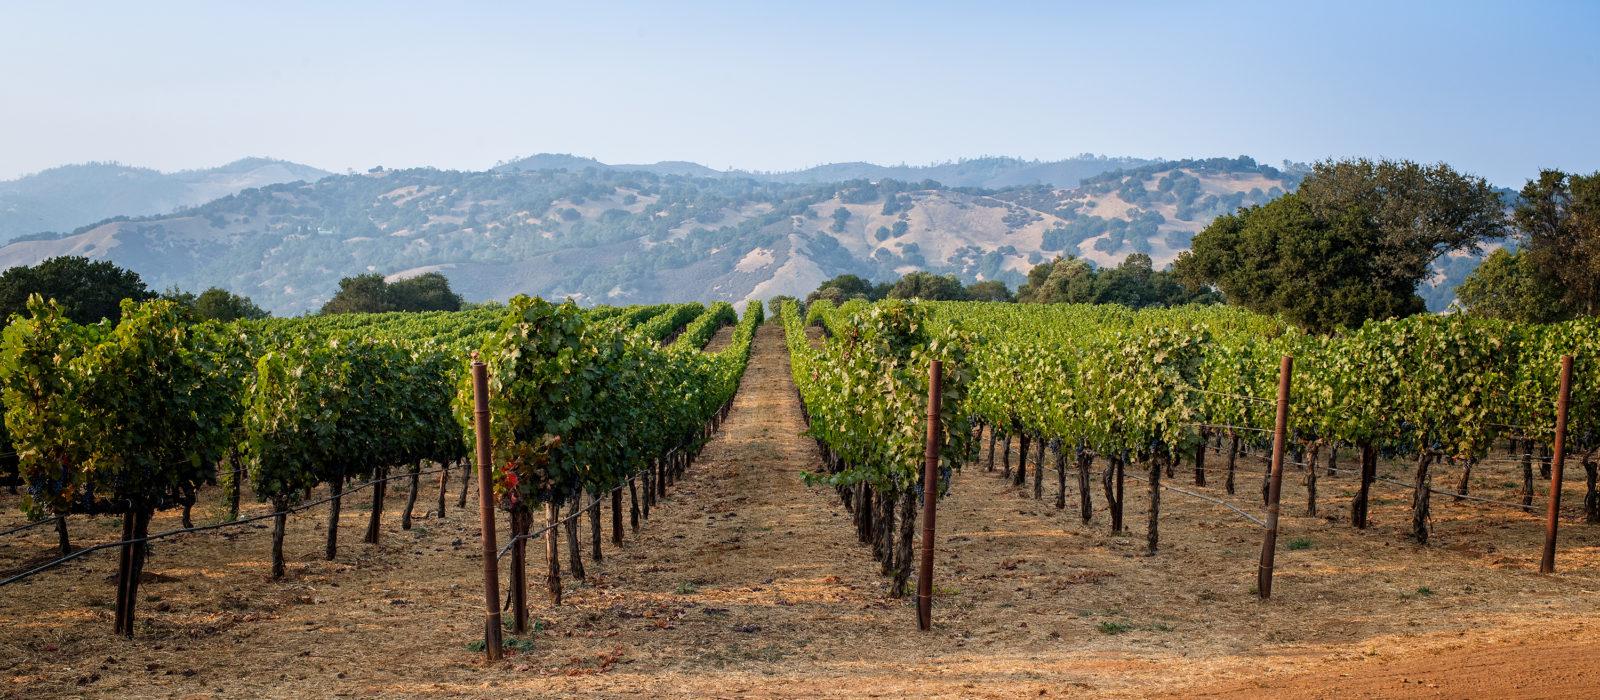 Chappellet Vineyards